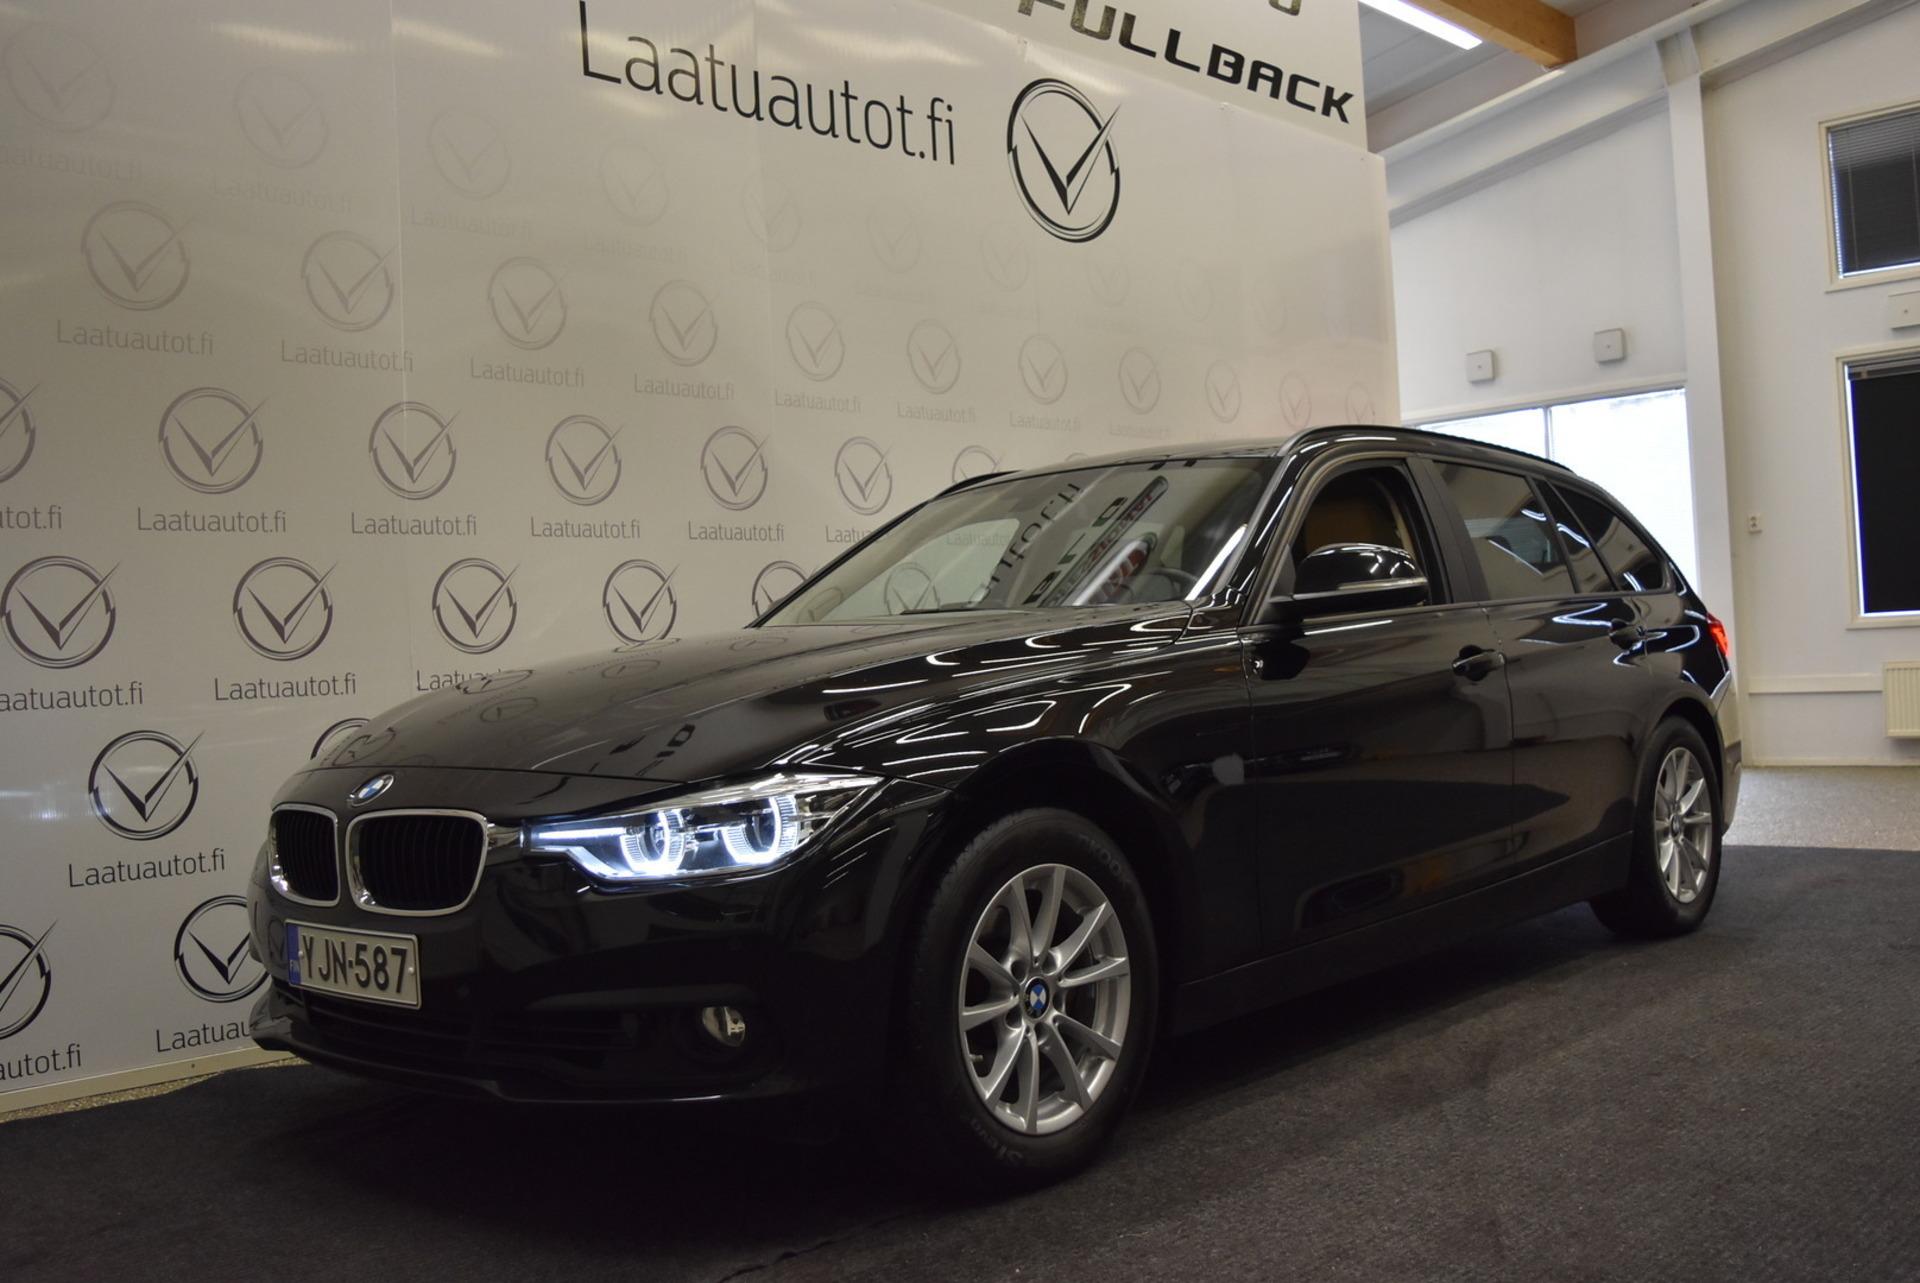 BMW 320 F31 Touring 320i A xDrive Business Exclusive Edition - Korko 1, 99%+kulut,  Led-ajovalot,  Nahkasisusta,  Urheiluistuimet